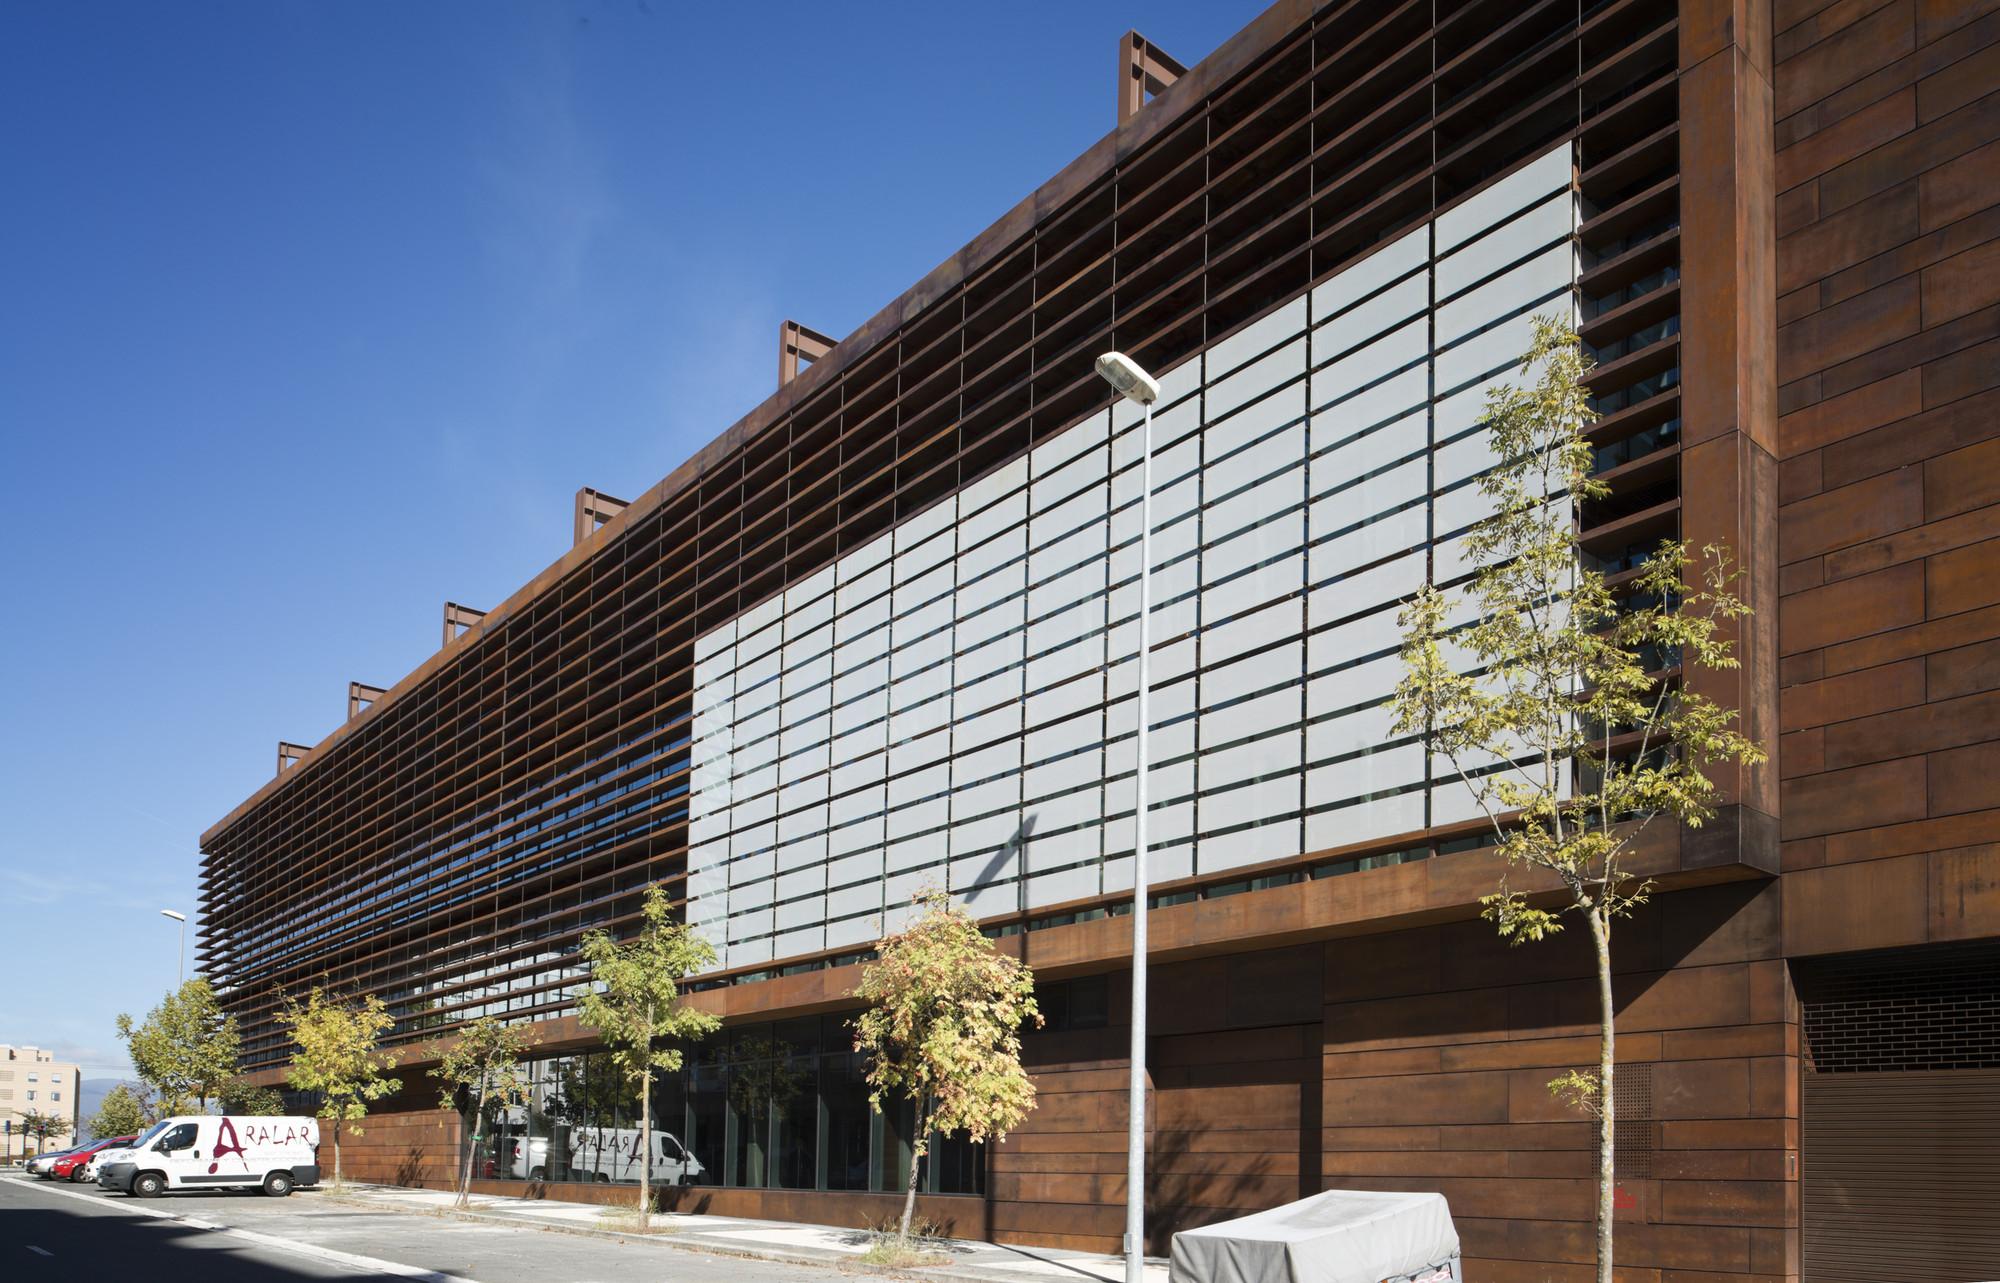 Galer a de edificio de oficinas en vitoria lh14 arquitectos 2 - Arquitectos en vitoria ...